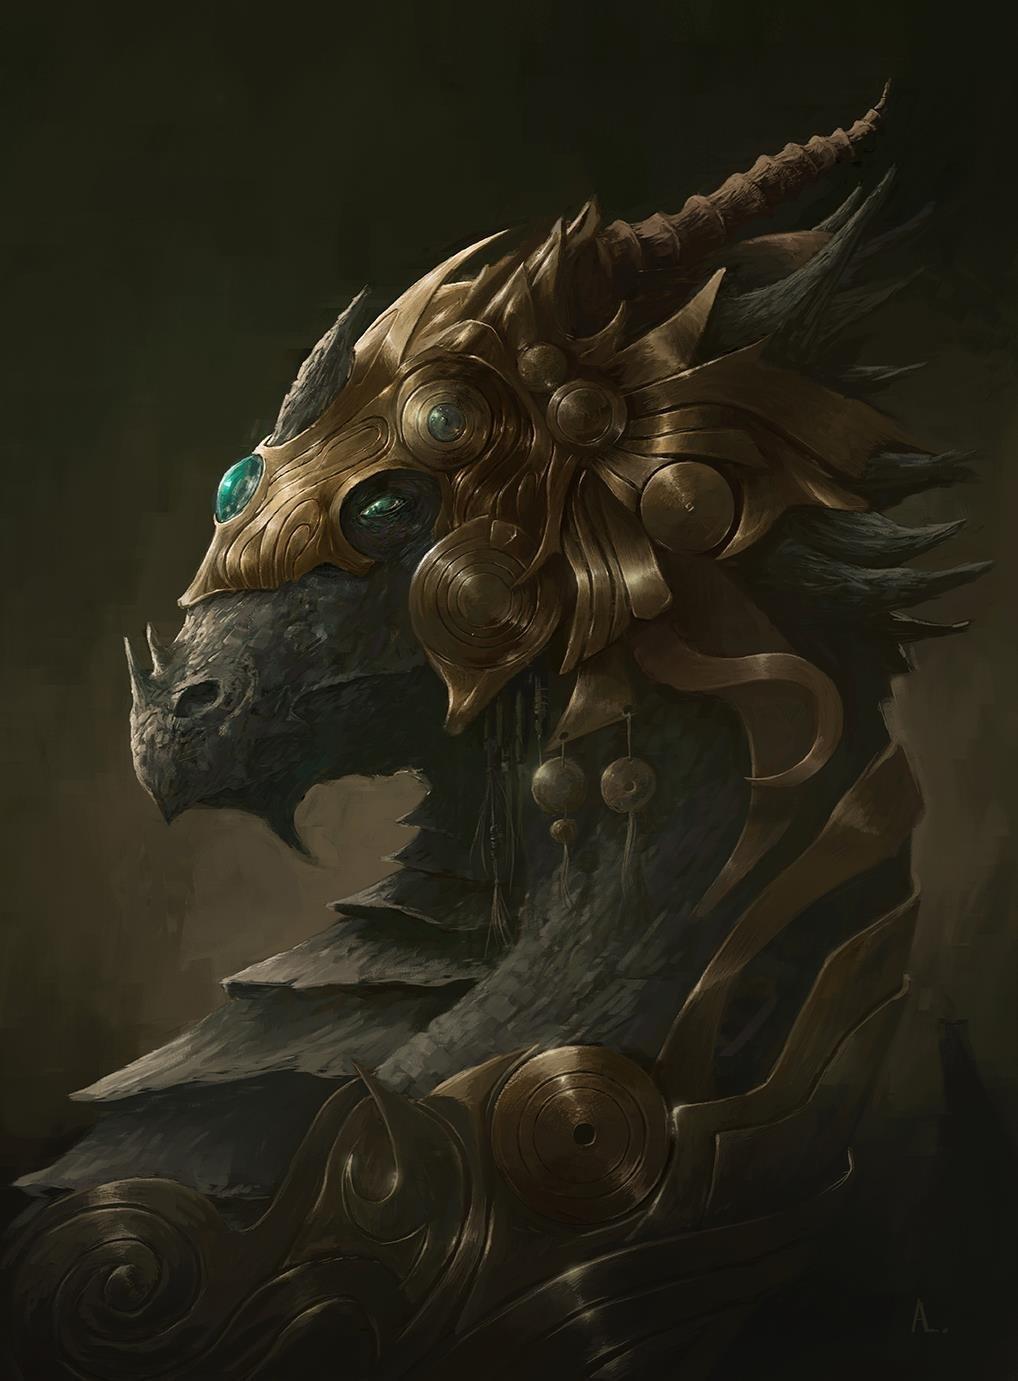 alejandro-rojas-drac